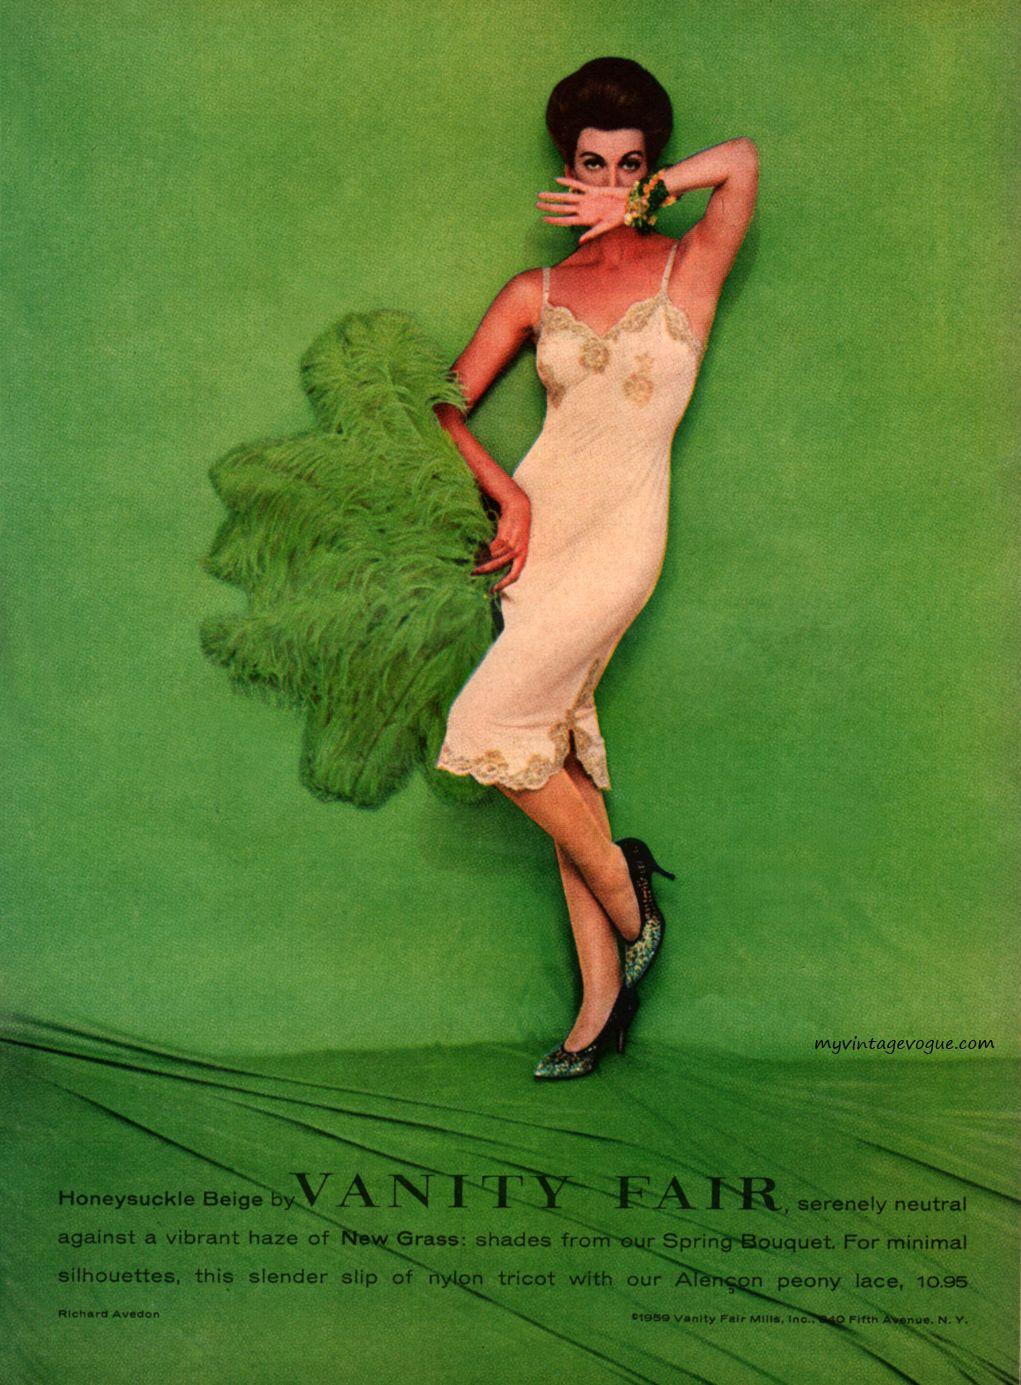 Vanity Fair 1959 - photo by Richard Avedon